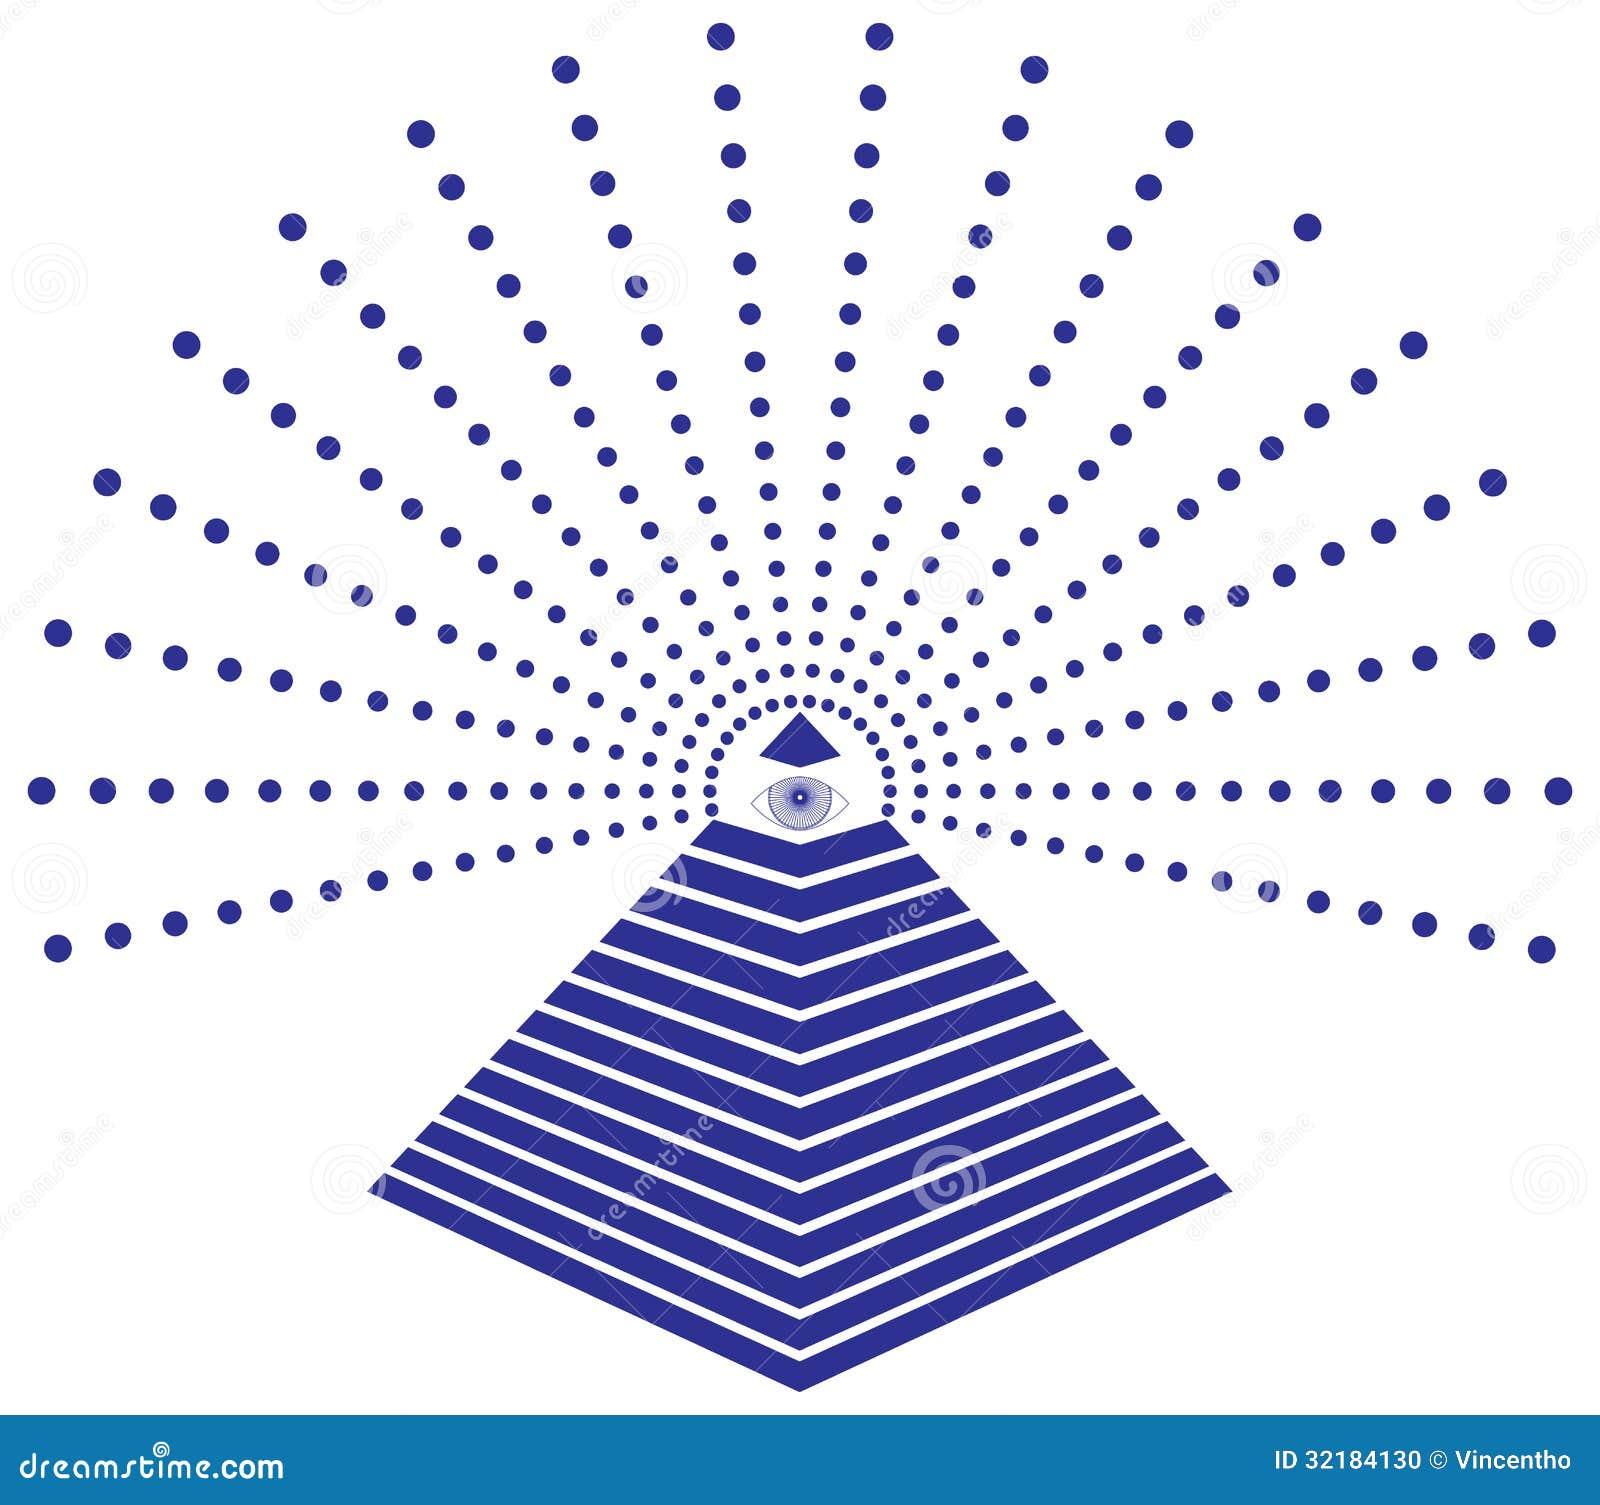 Глаз Freemason иллюстрации Провиденса